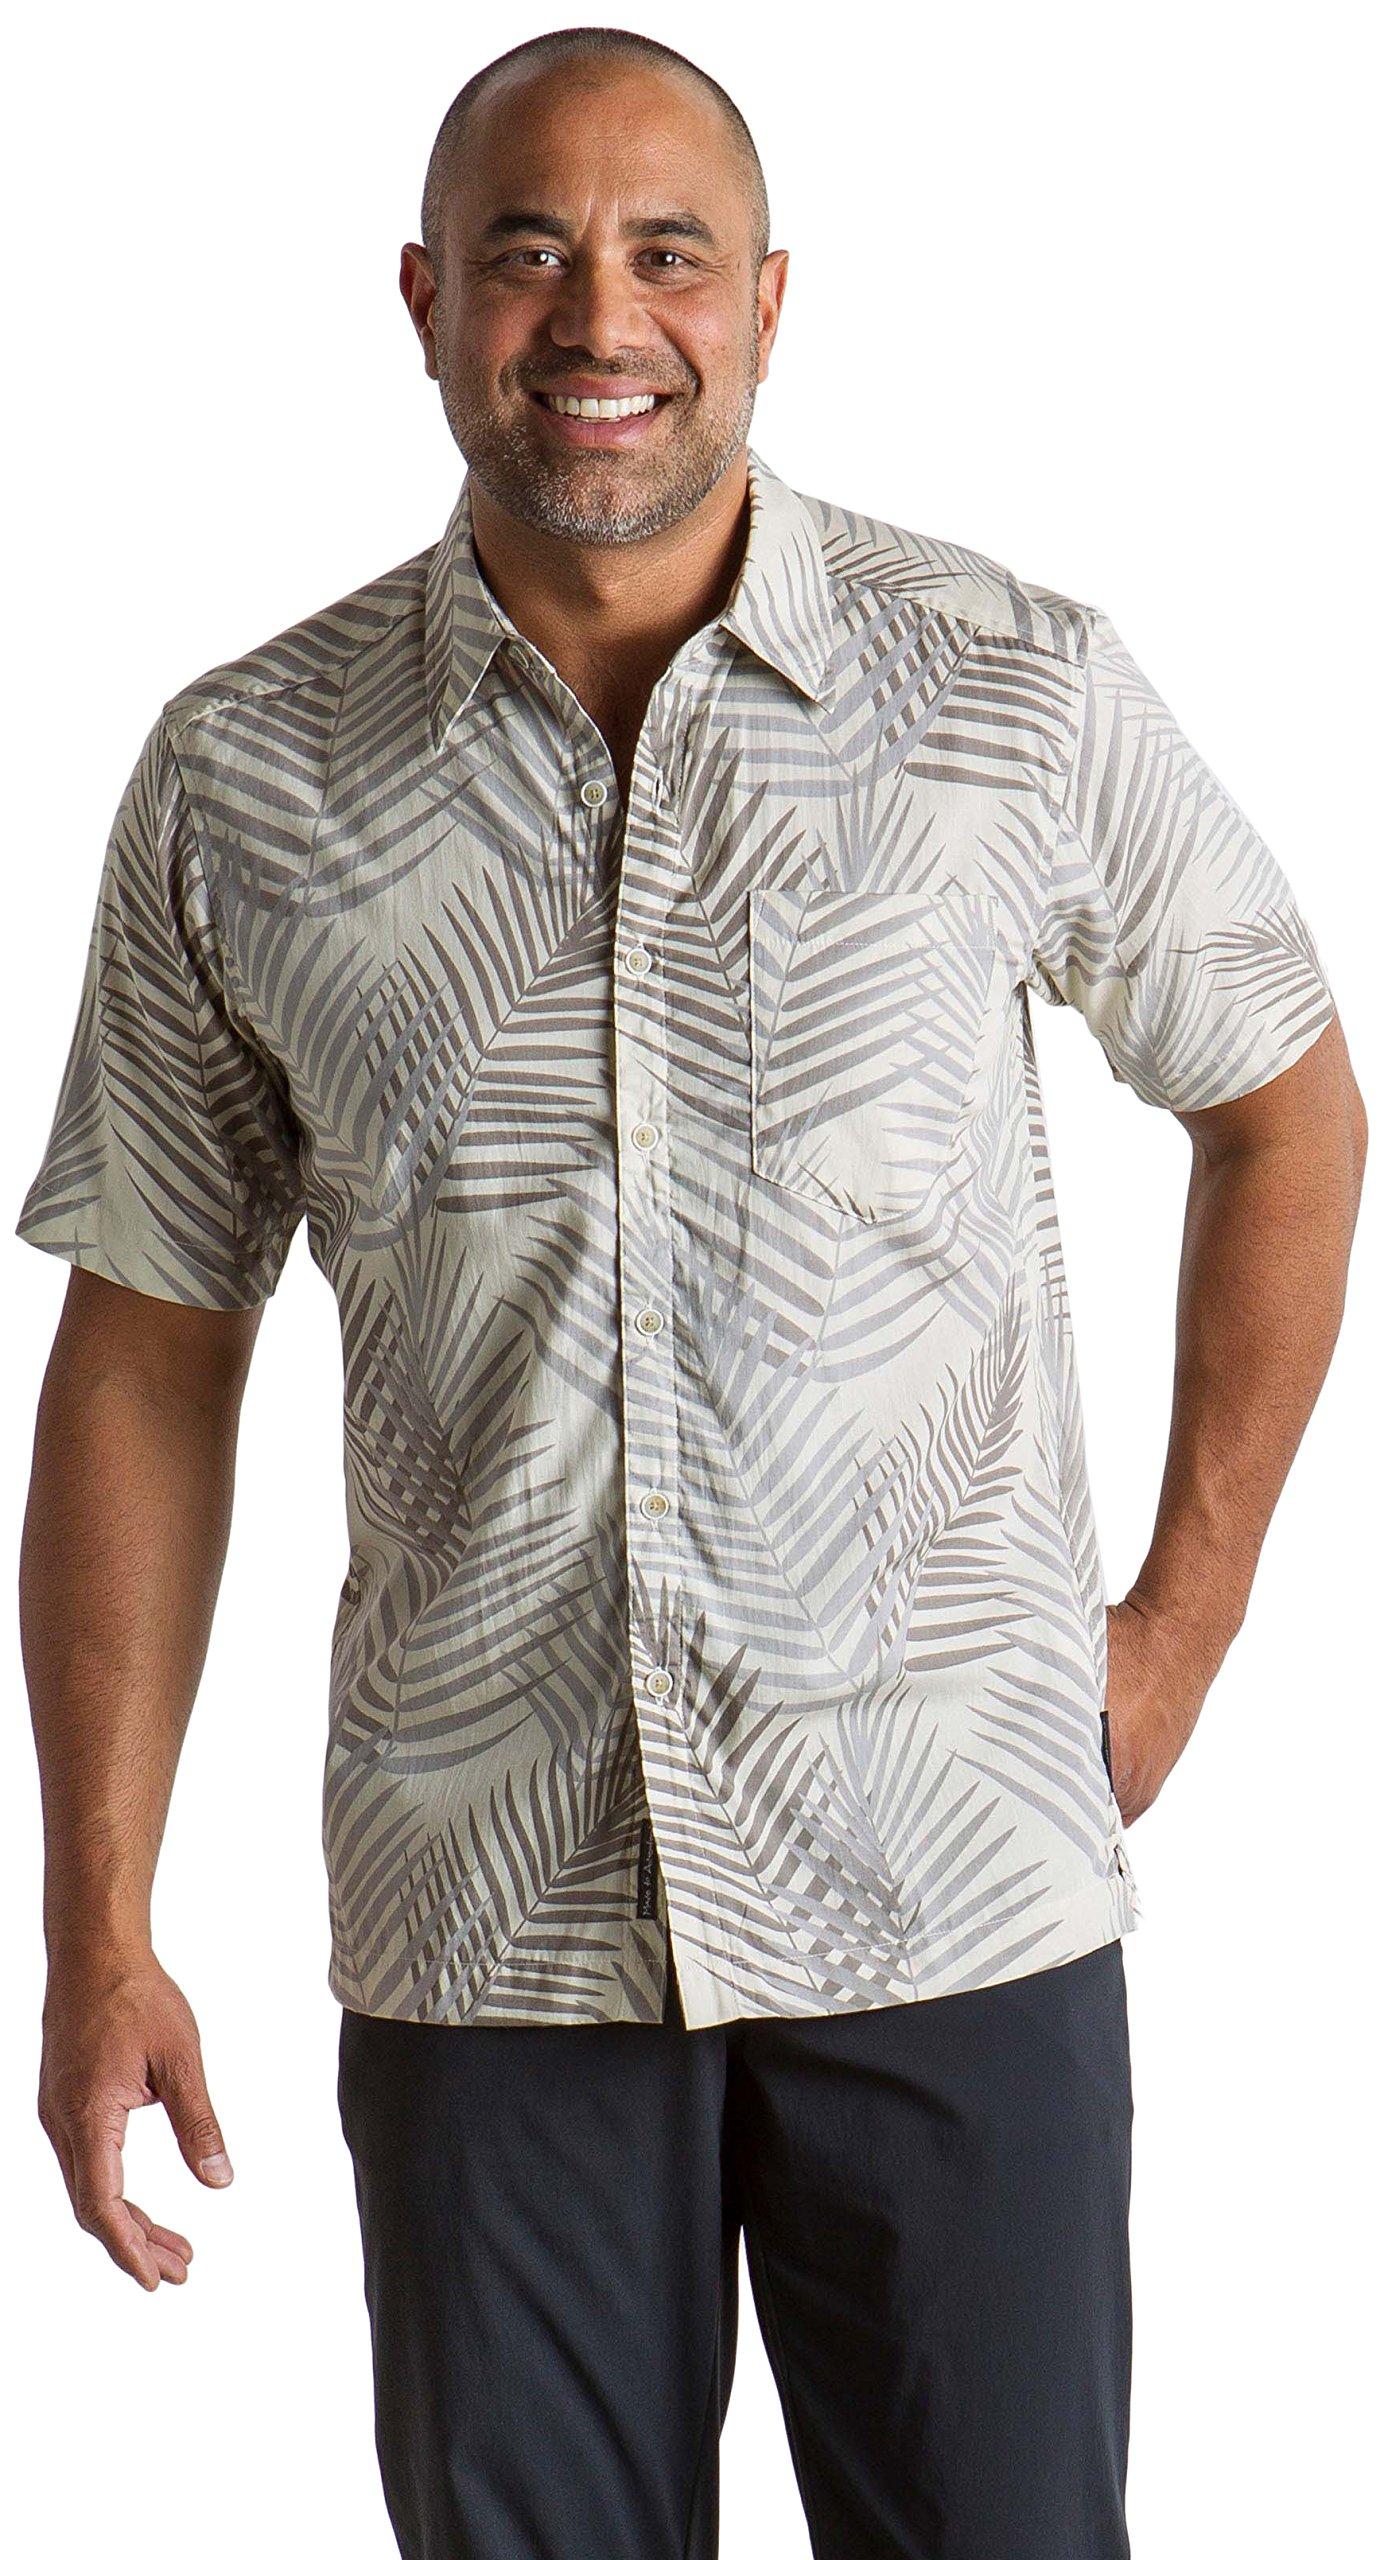 ExOfficio Men's Next-to-Nothing Pindo Print Lightweight Short-Sleeve Shirt, Light Stone, Large